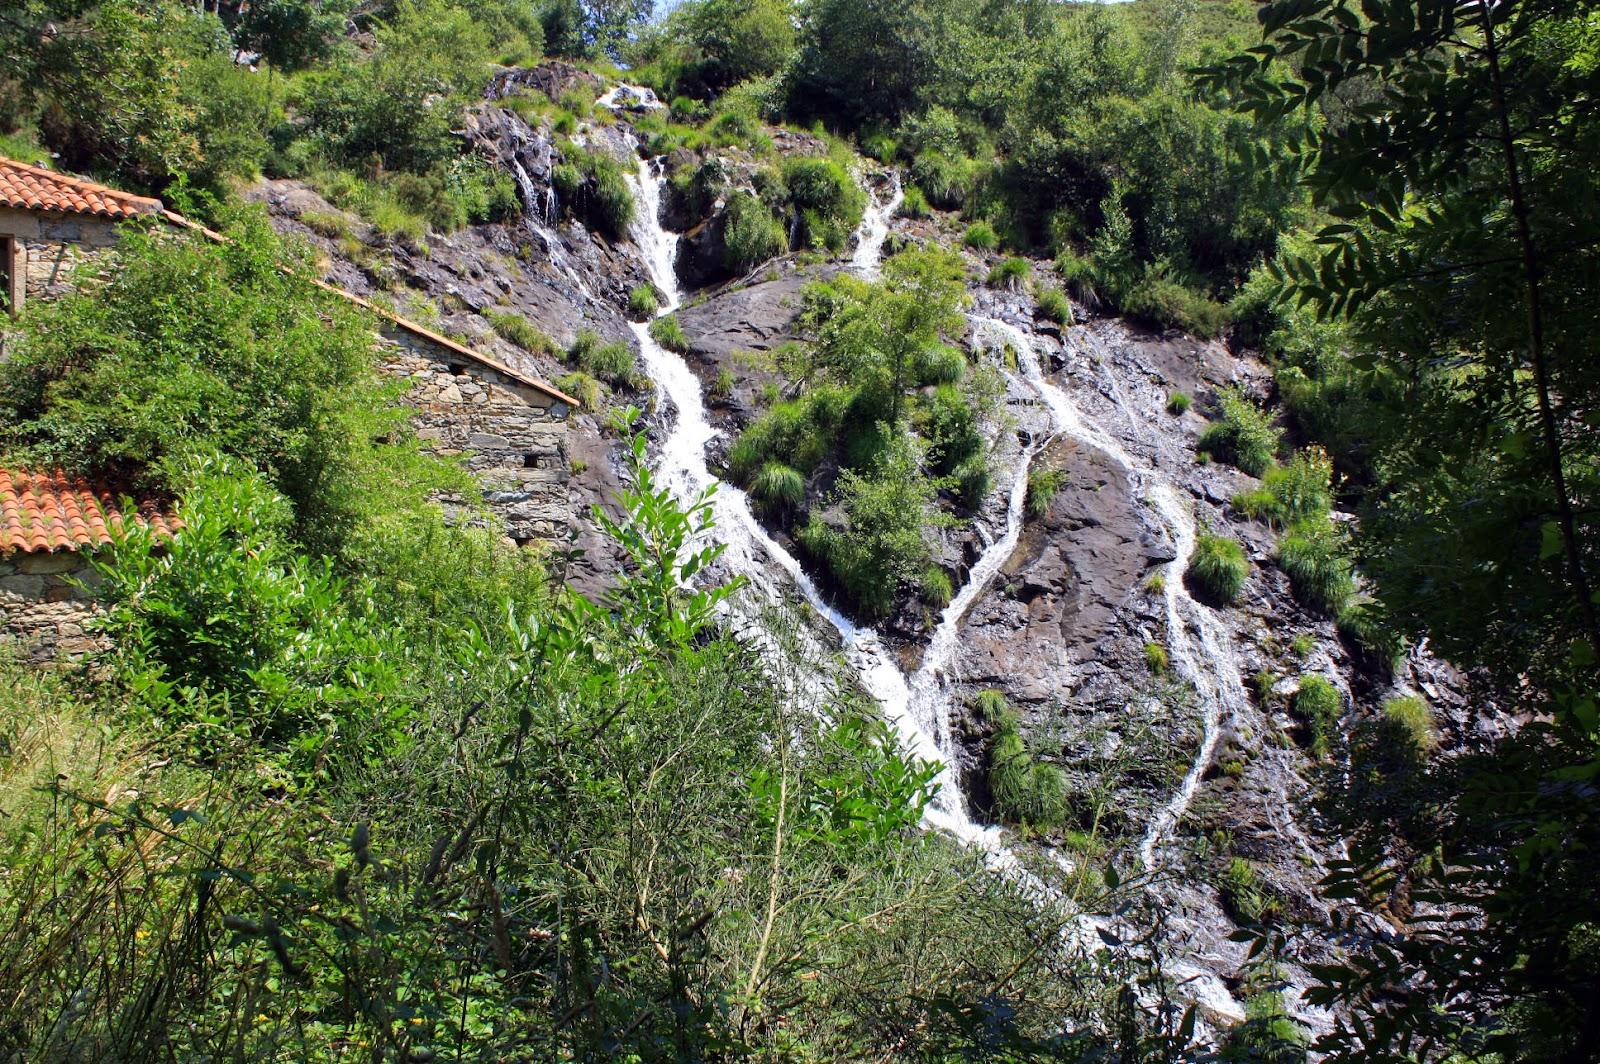 Luar na fraga: Camino de la fervenza de Brañas (Toques)